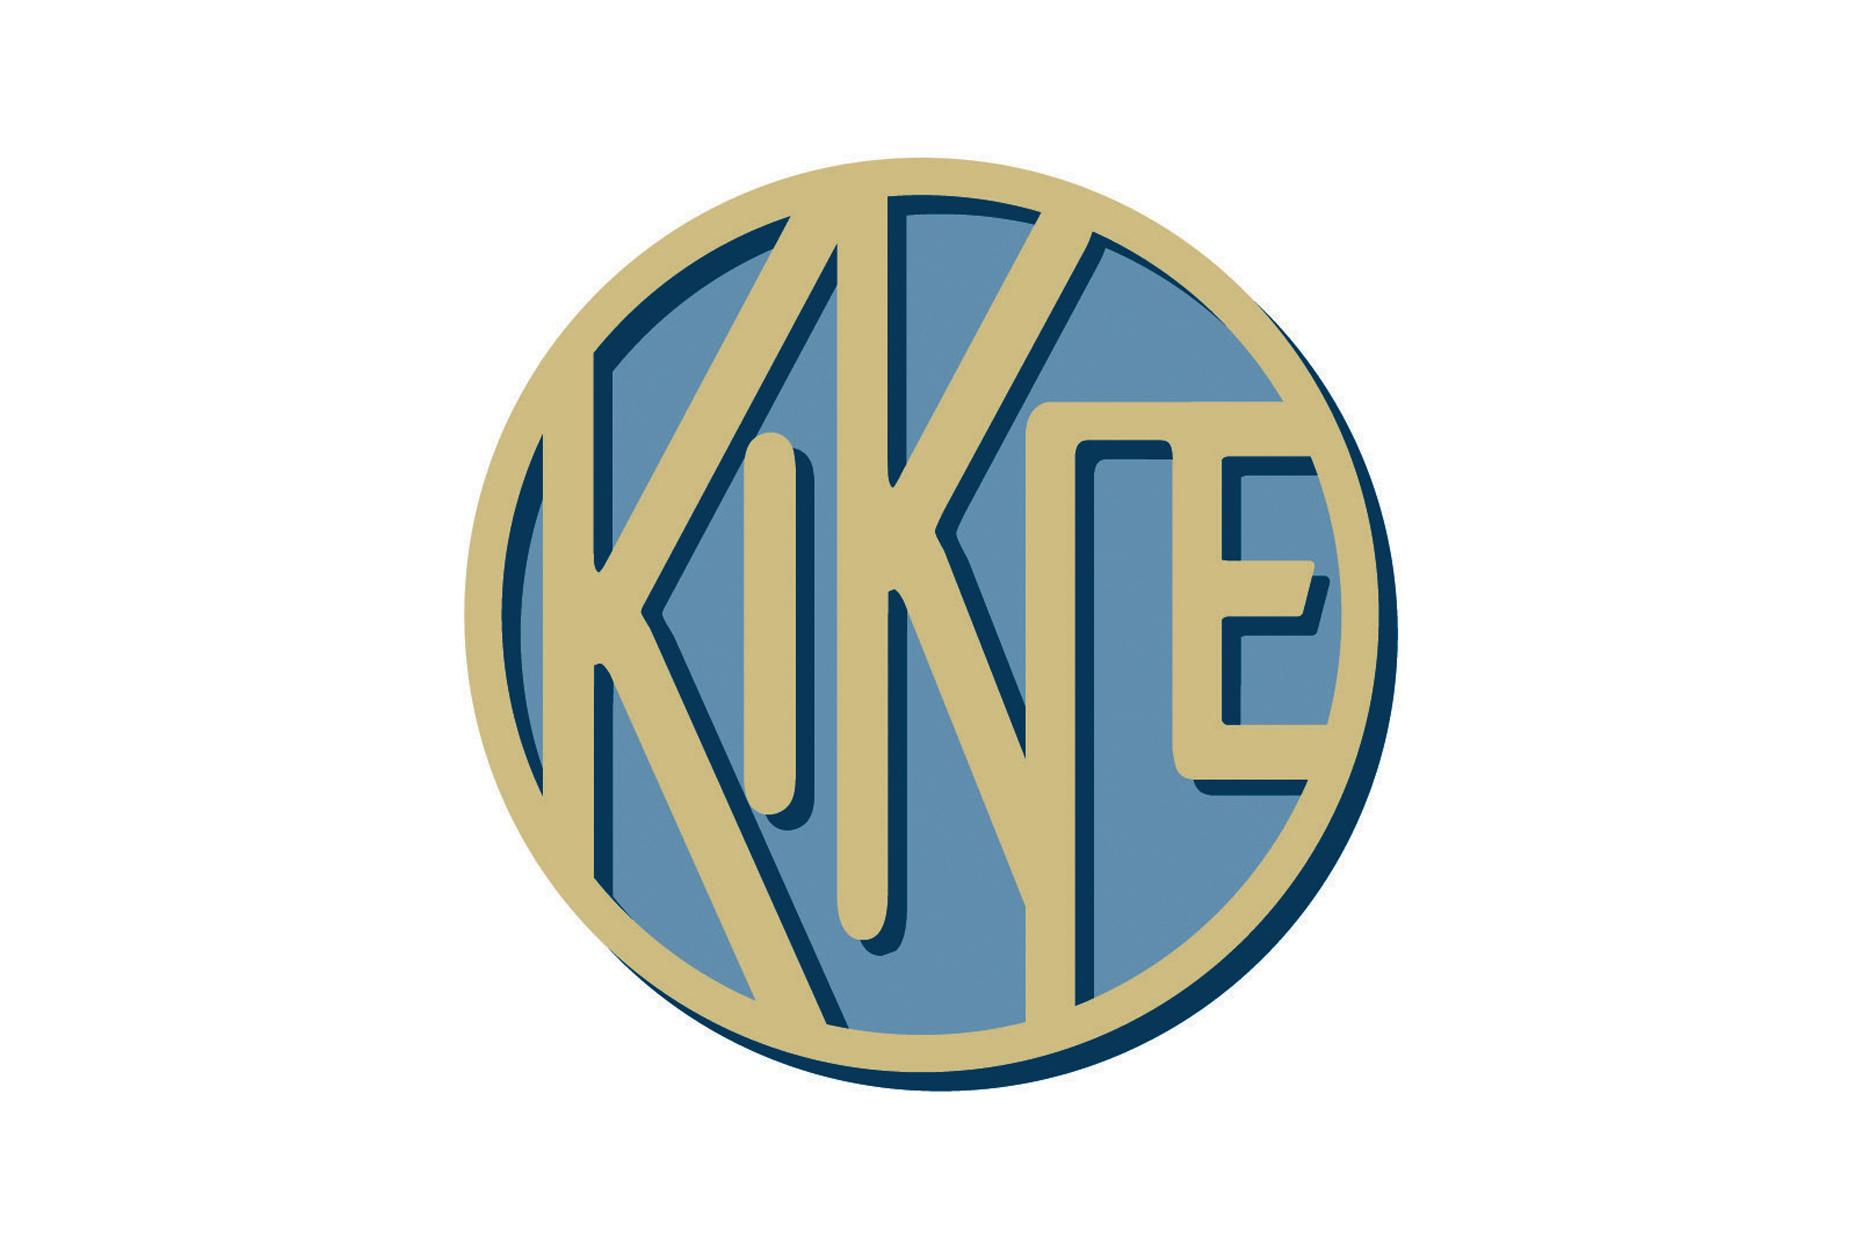 KIKPE logo